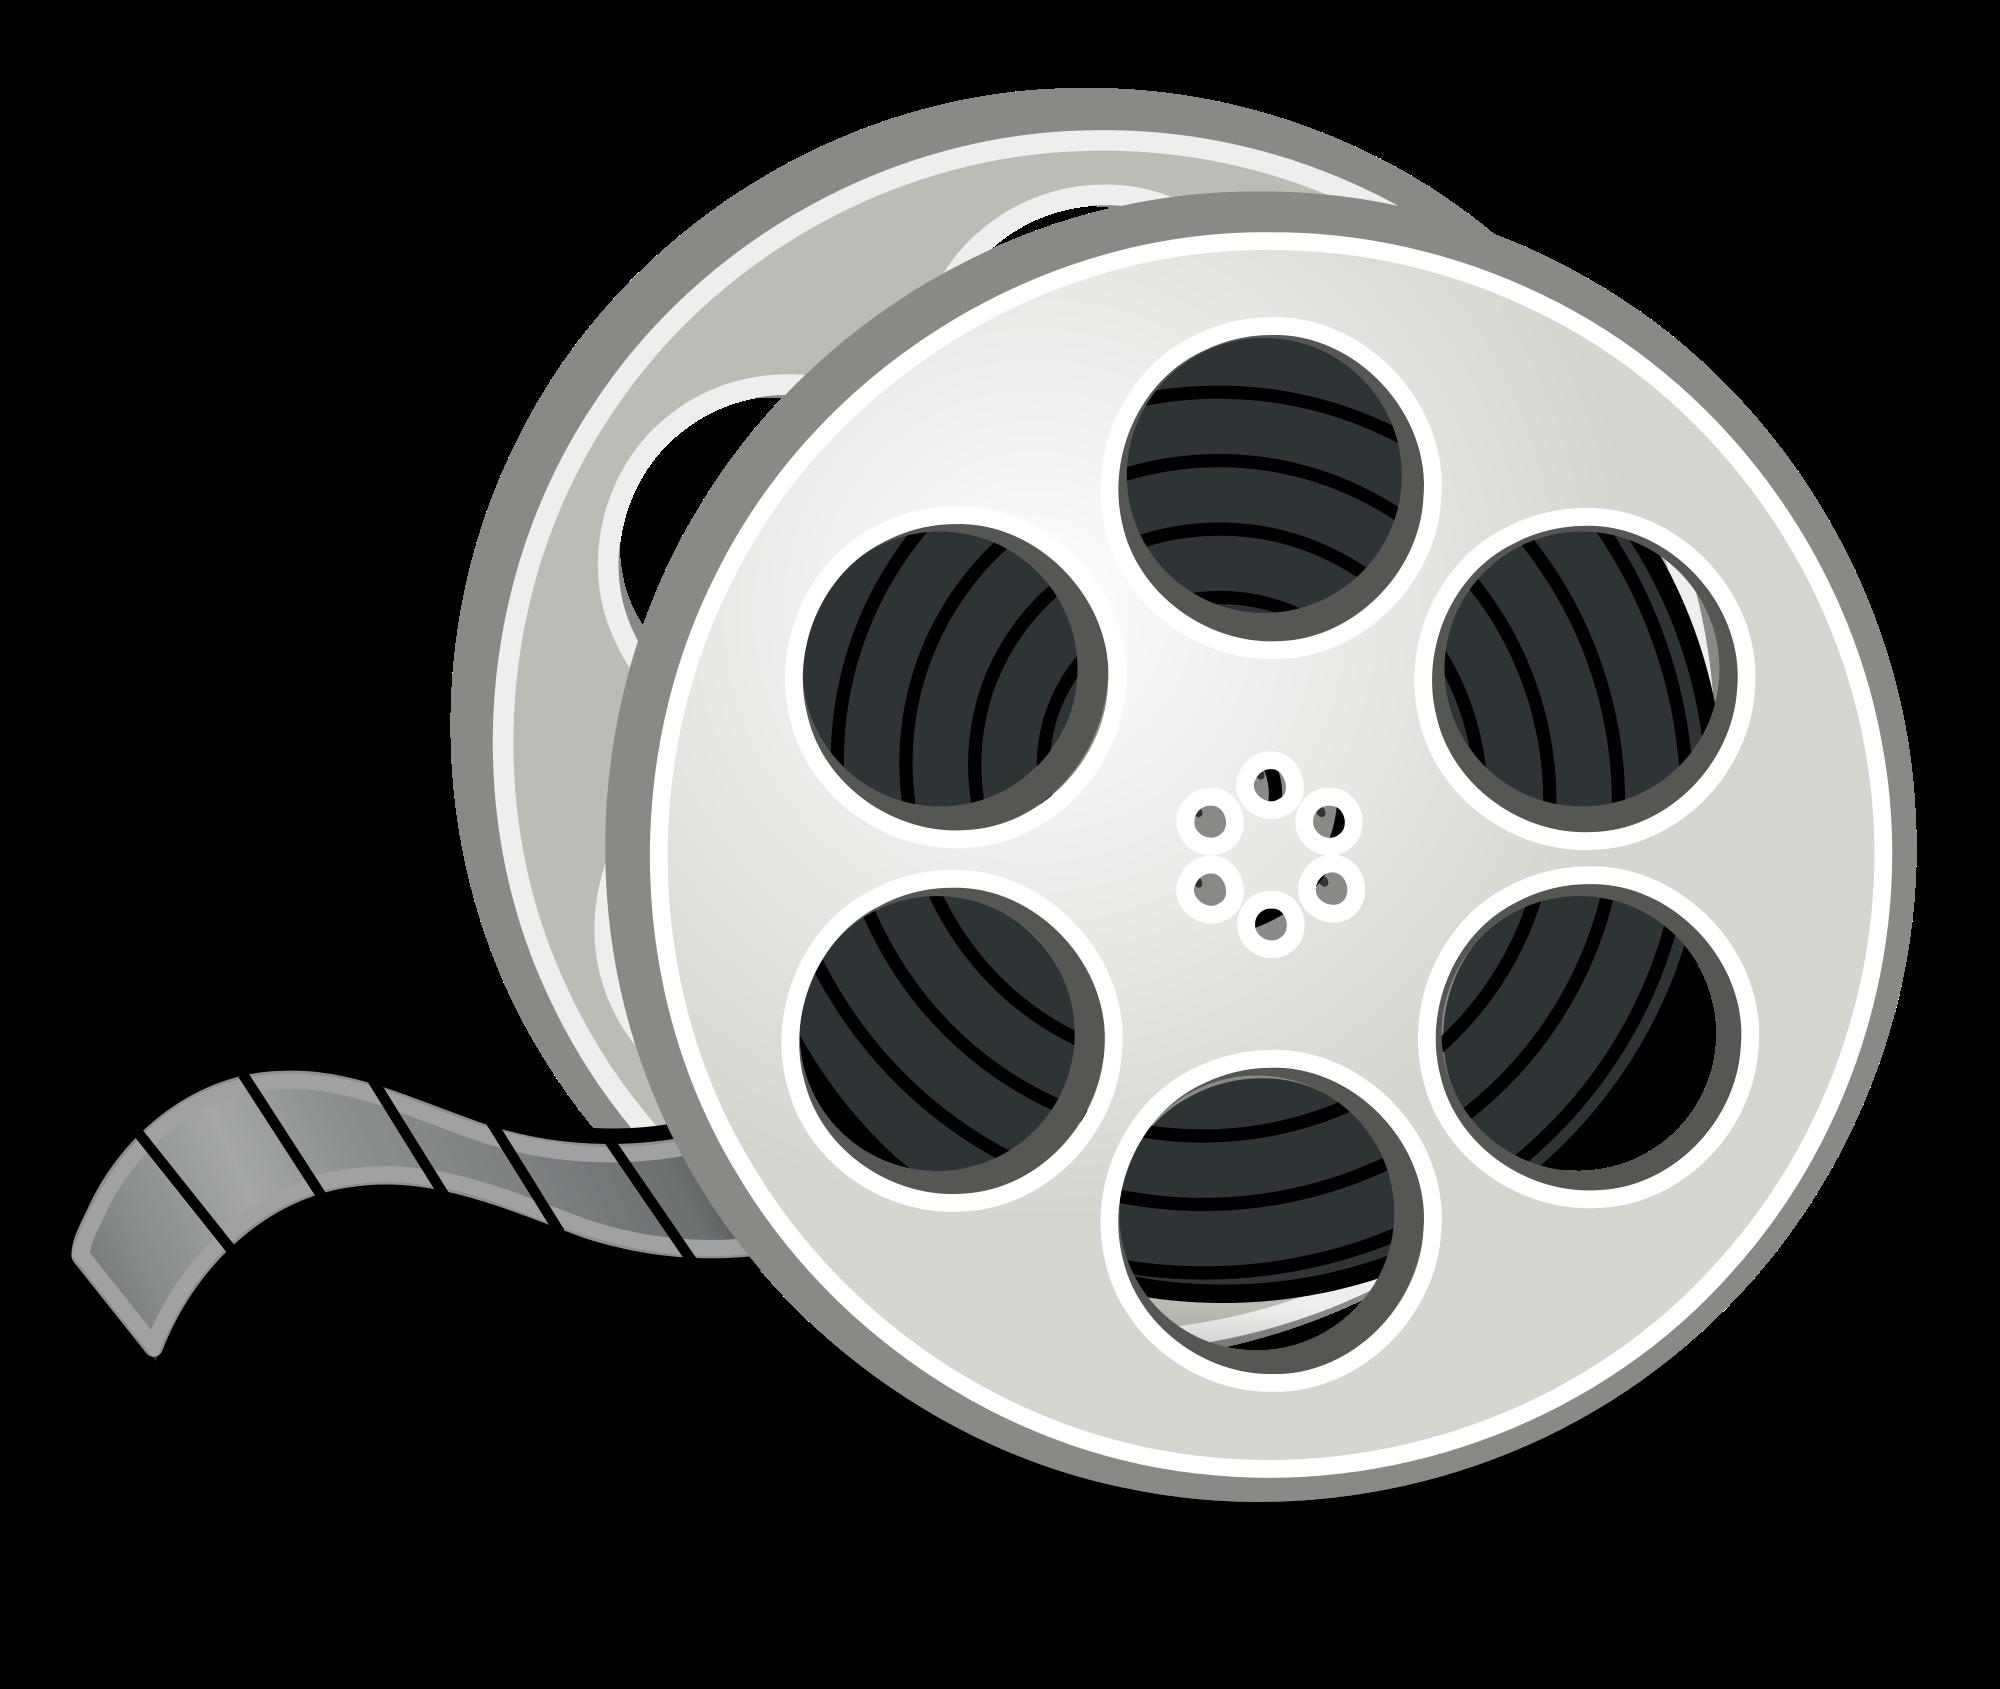 Movie svg #17, Download drawings